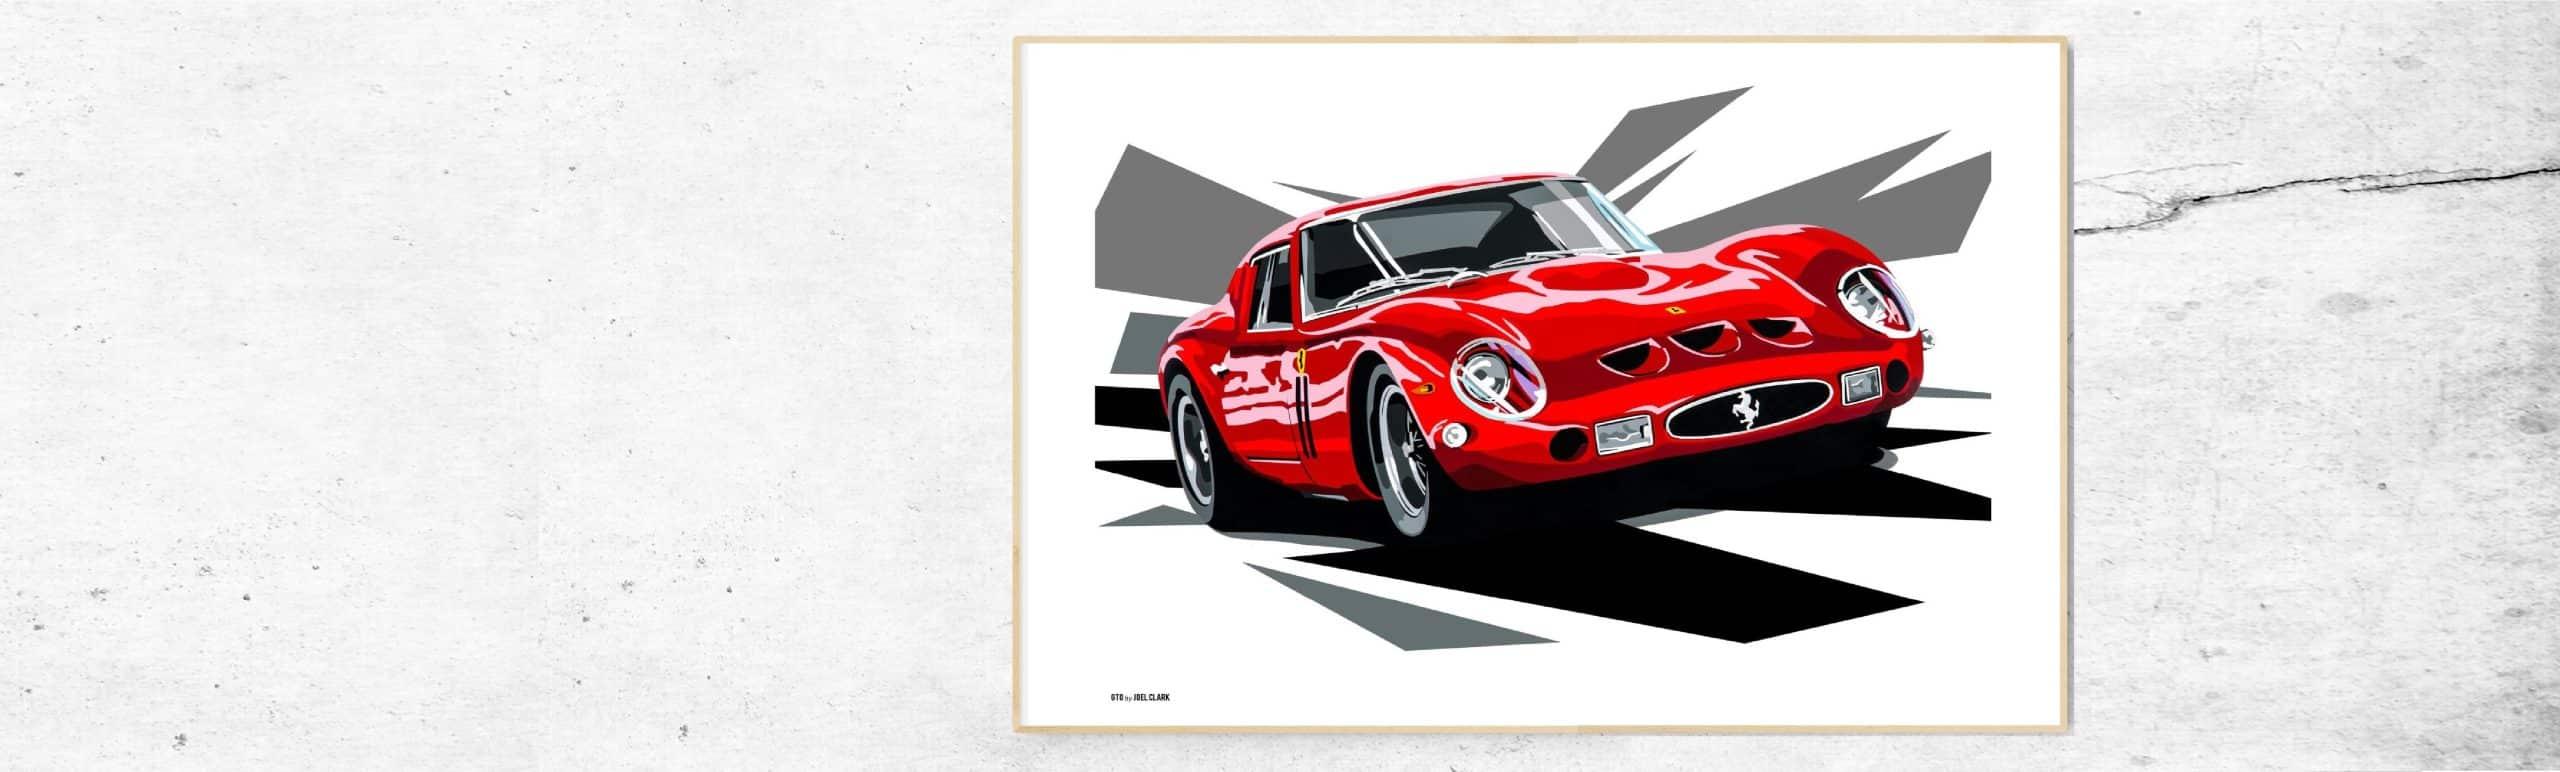 ferrari-enzo-GTO-250-kunst-schilderij